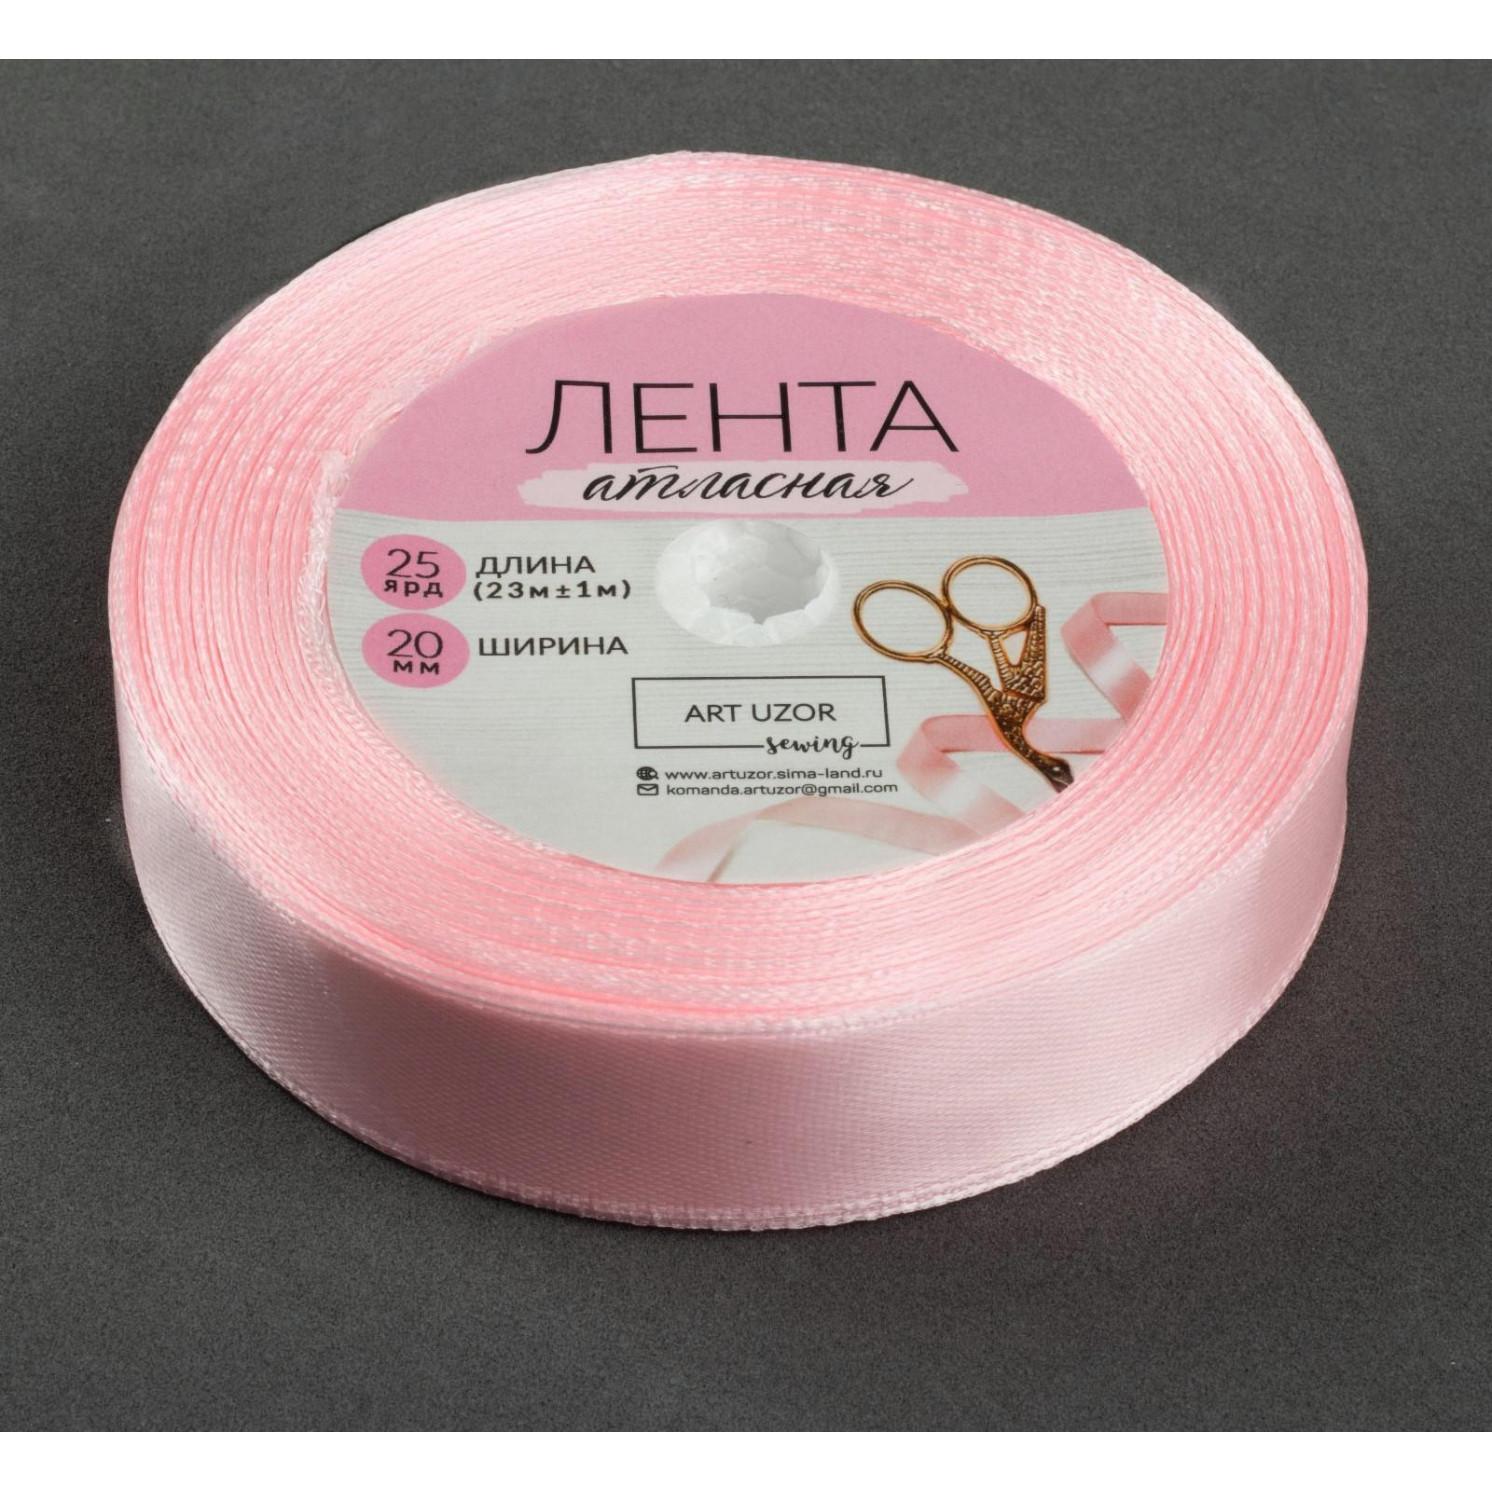 Лента атласная, 20 мм × 23 ± 1 м, цвет жемчужно-розовый №43